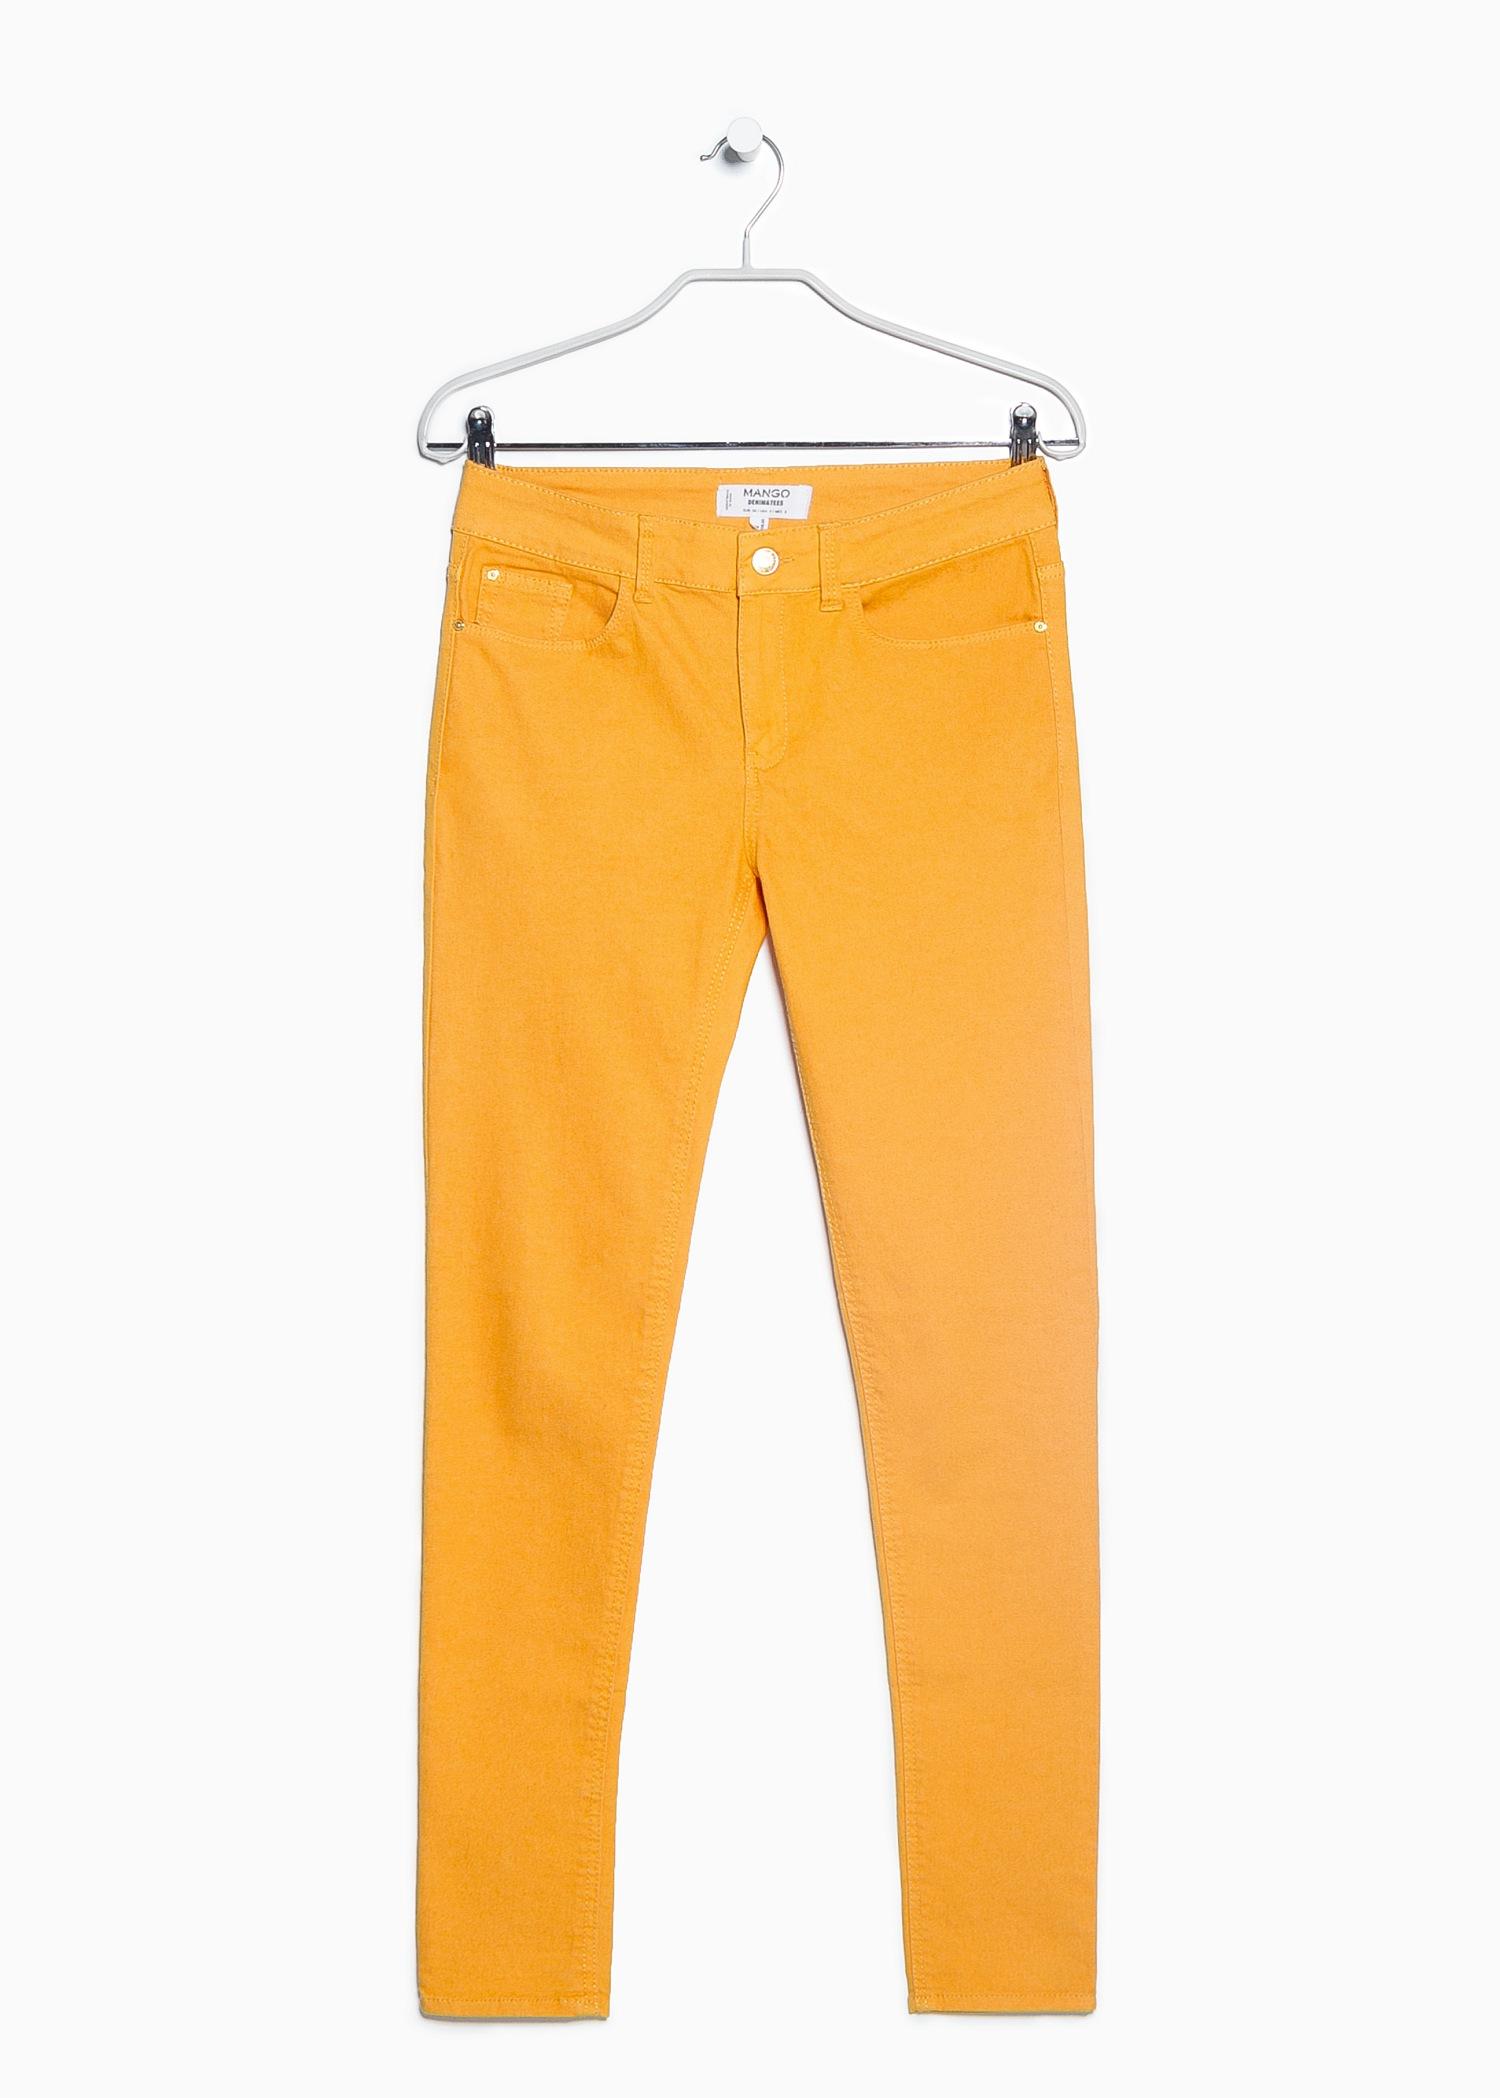 Banana Republic Jeans Women